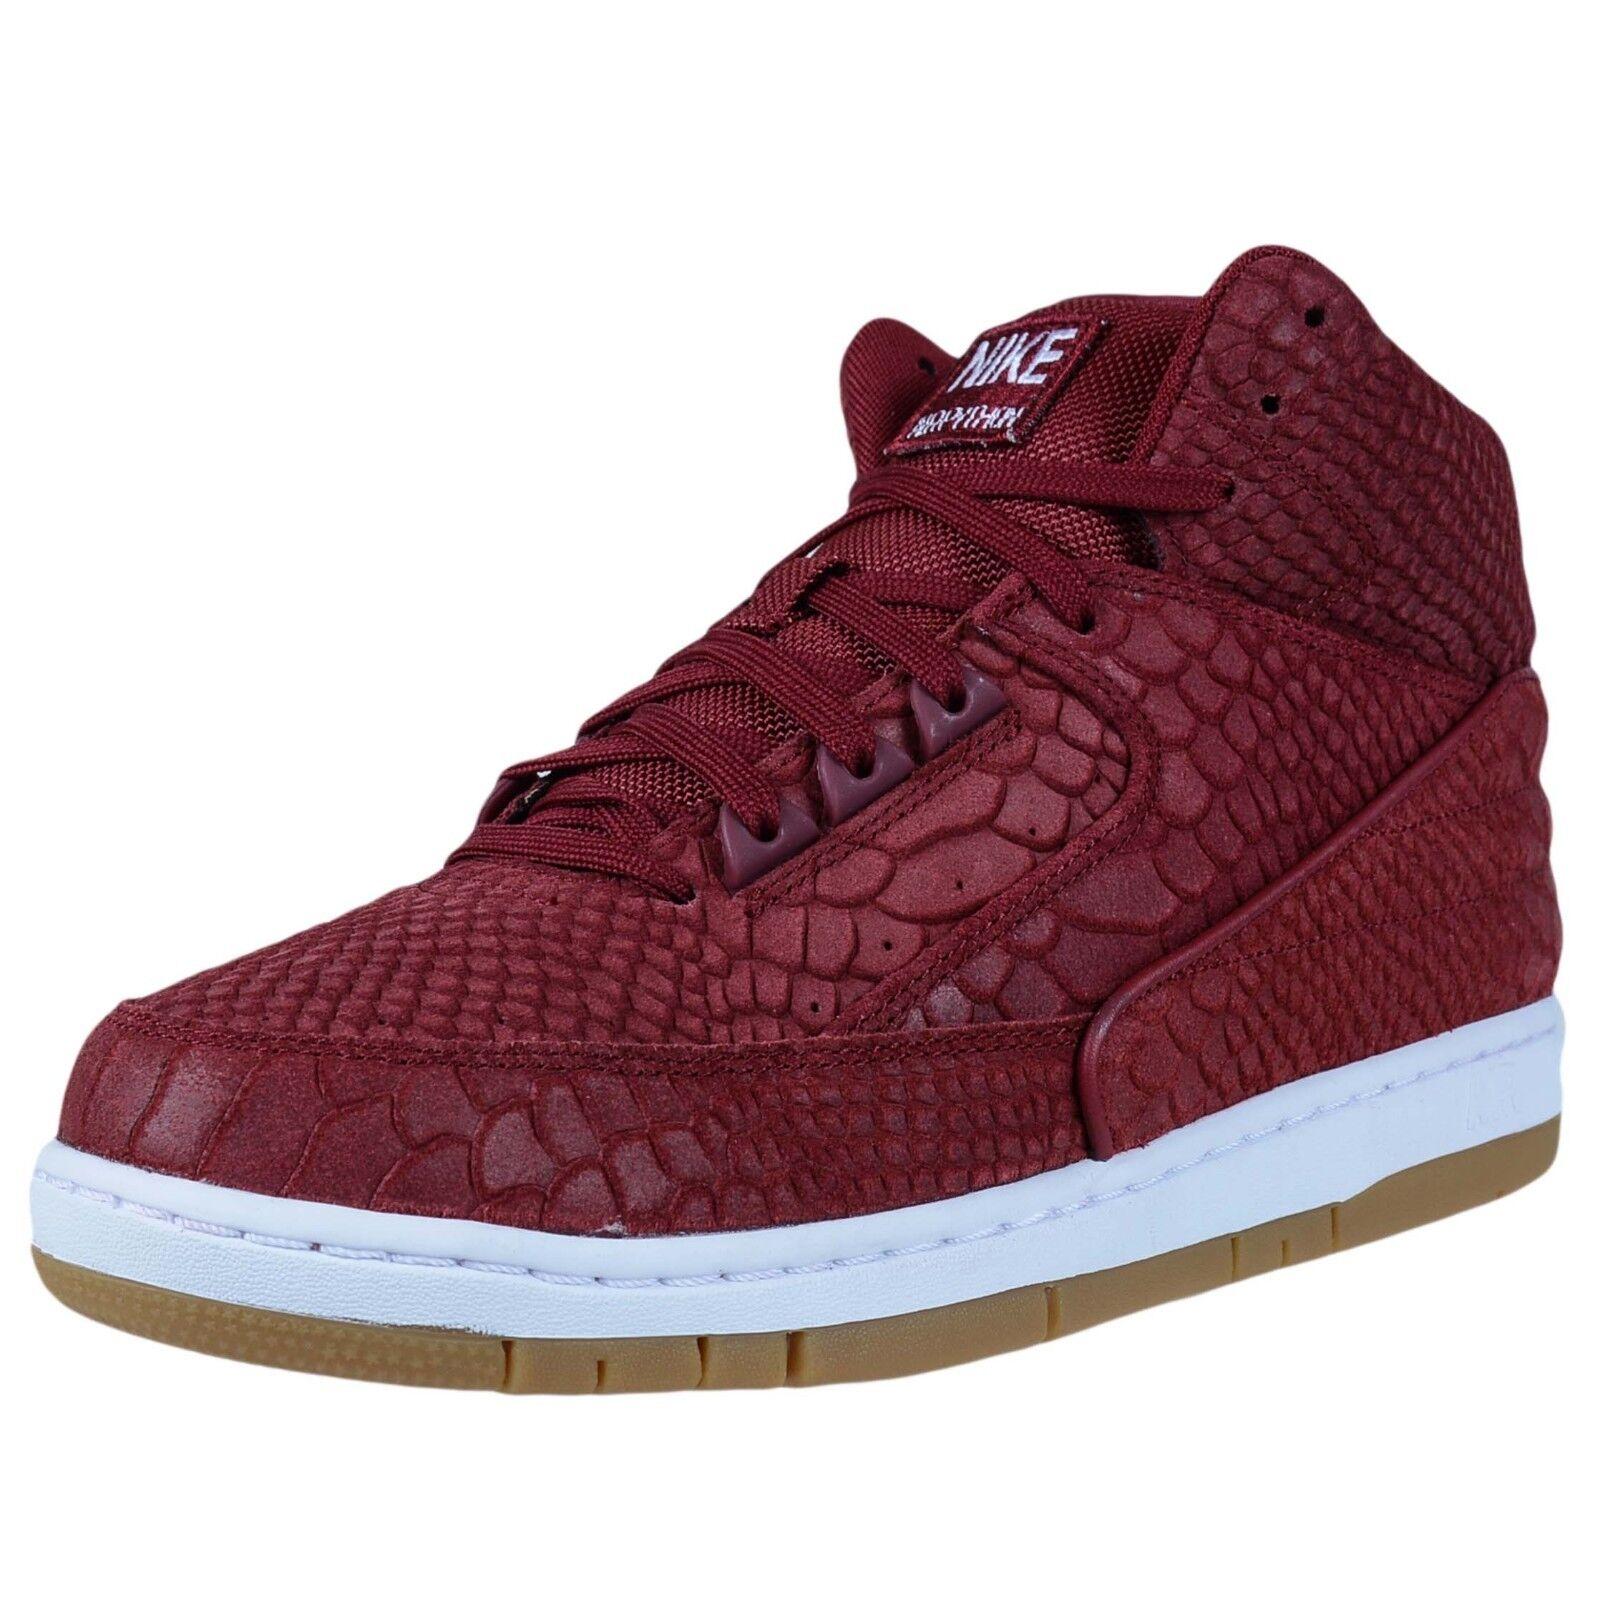 Nike Air rojo Python Premium Blanco Gum serpiente Baloncesto equipo rojo Air granate 705066 601 887299